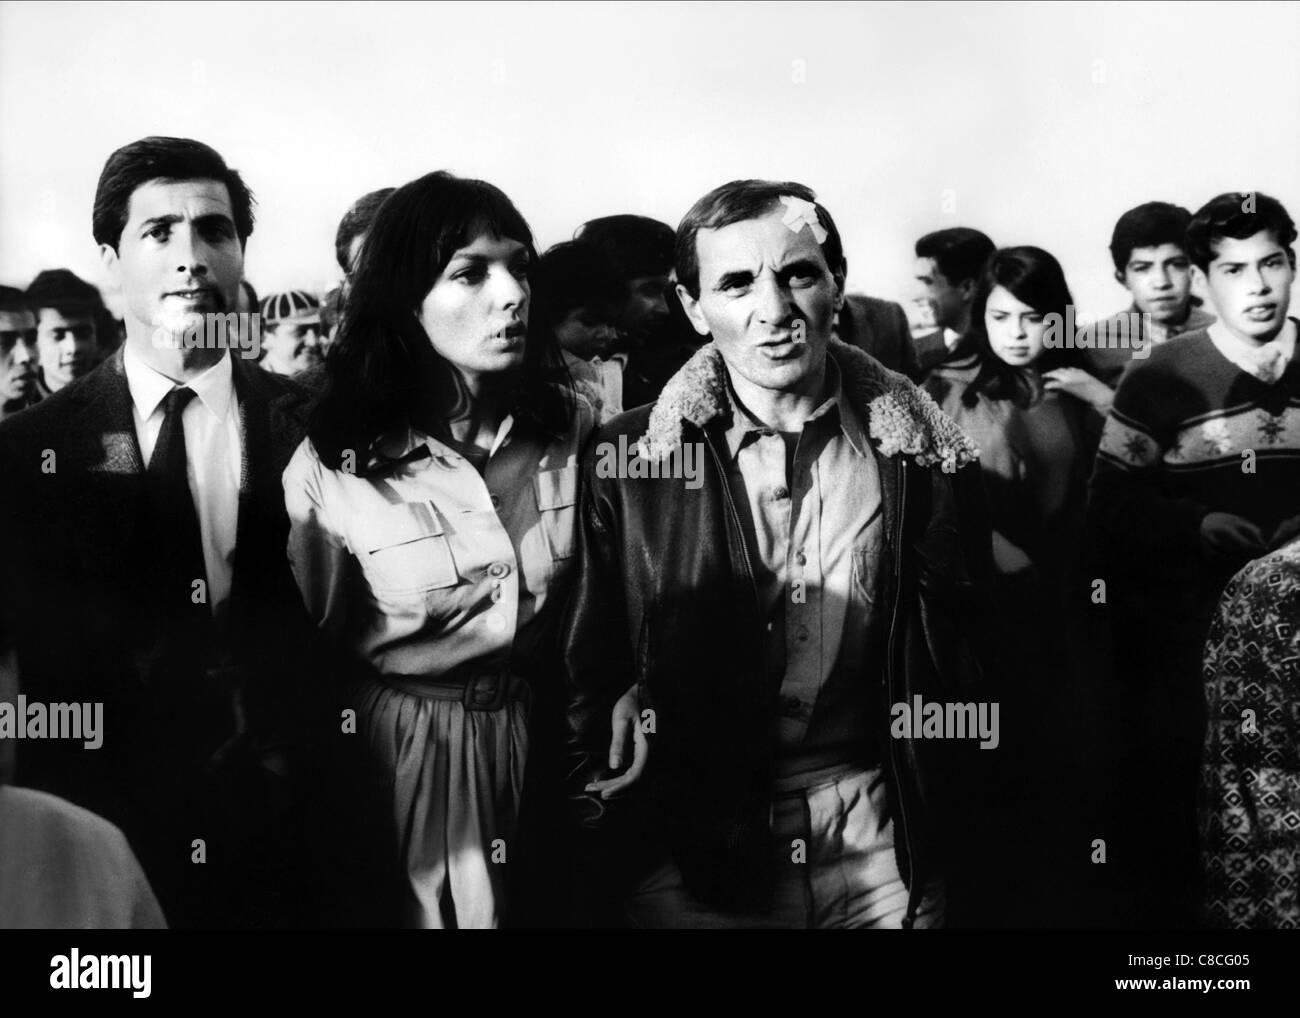 MARIE LAFORET, CHARLES AZNAVOUR, RAT TRAP, 1963 - Stock Image